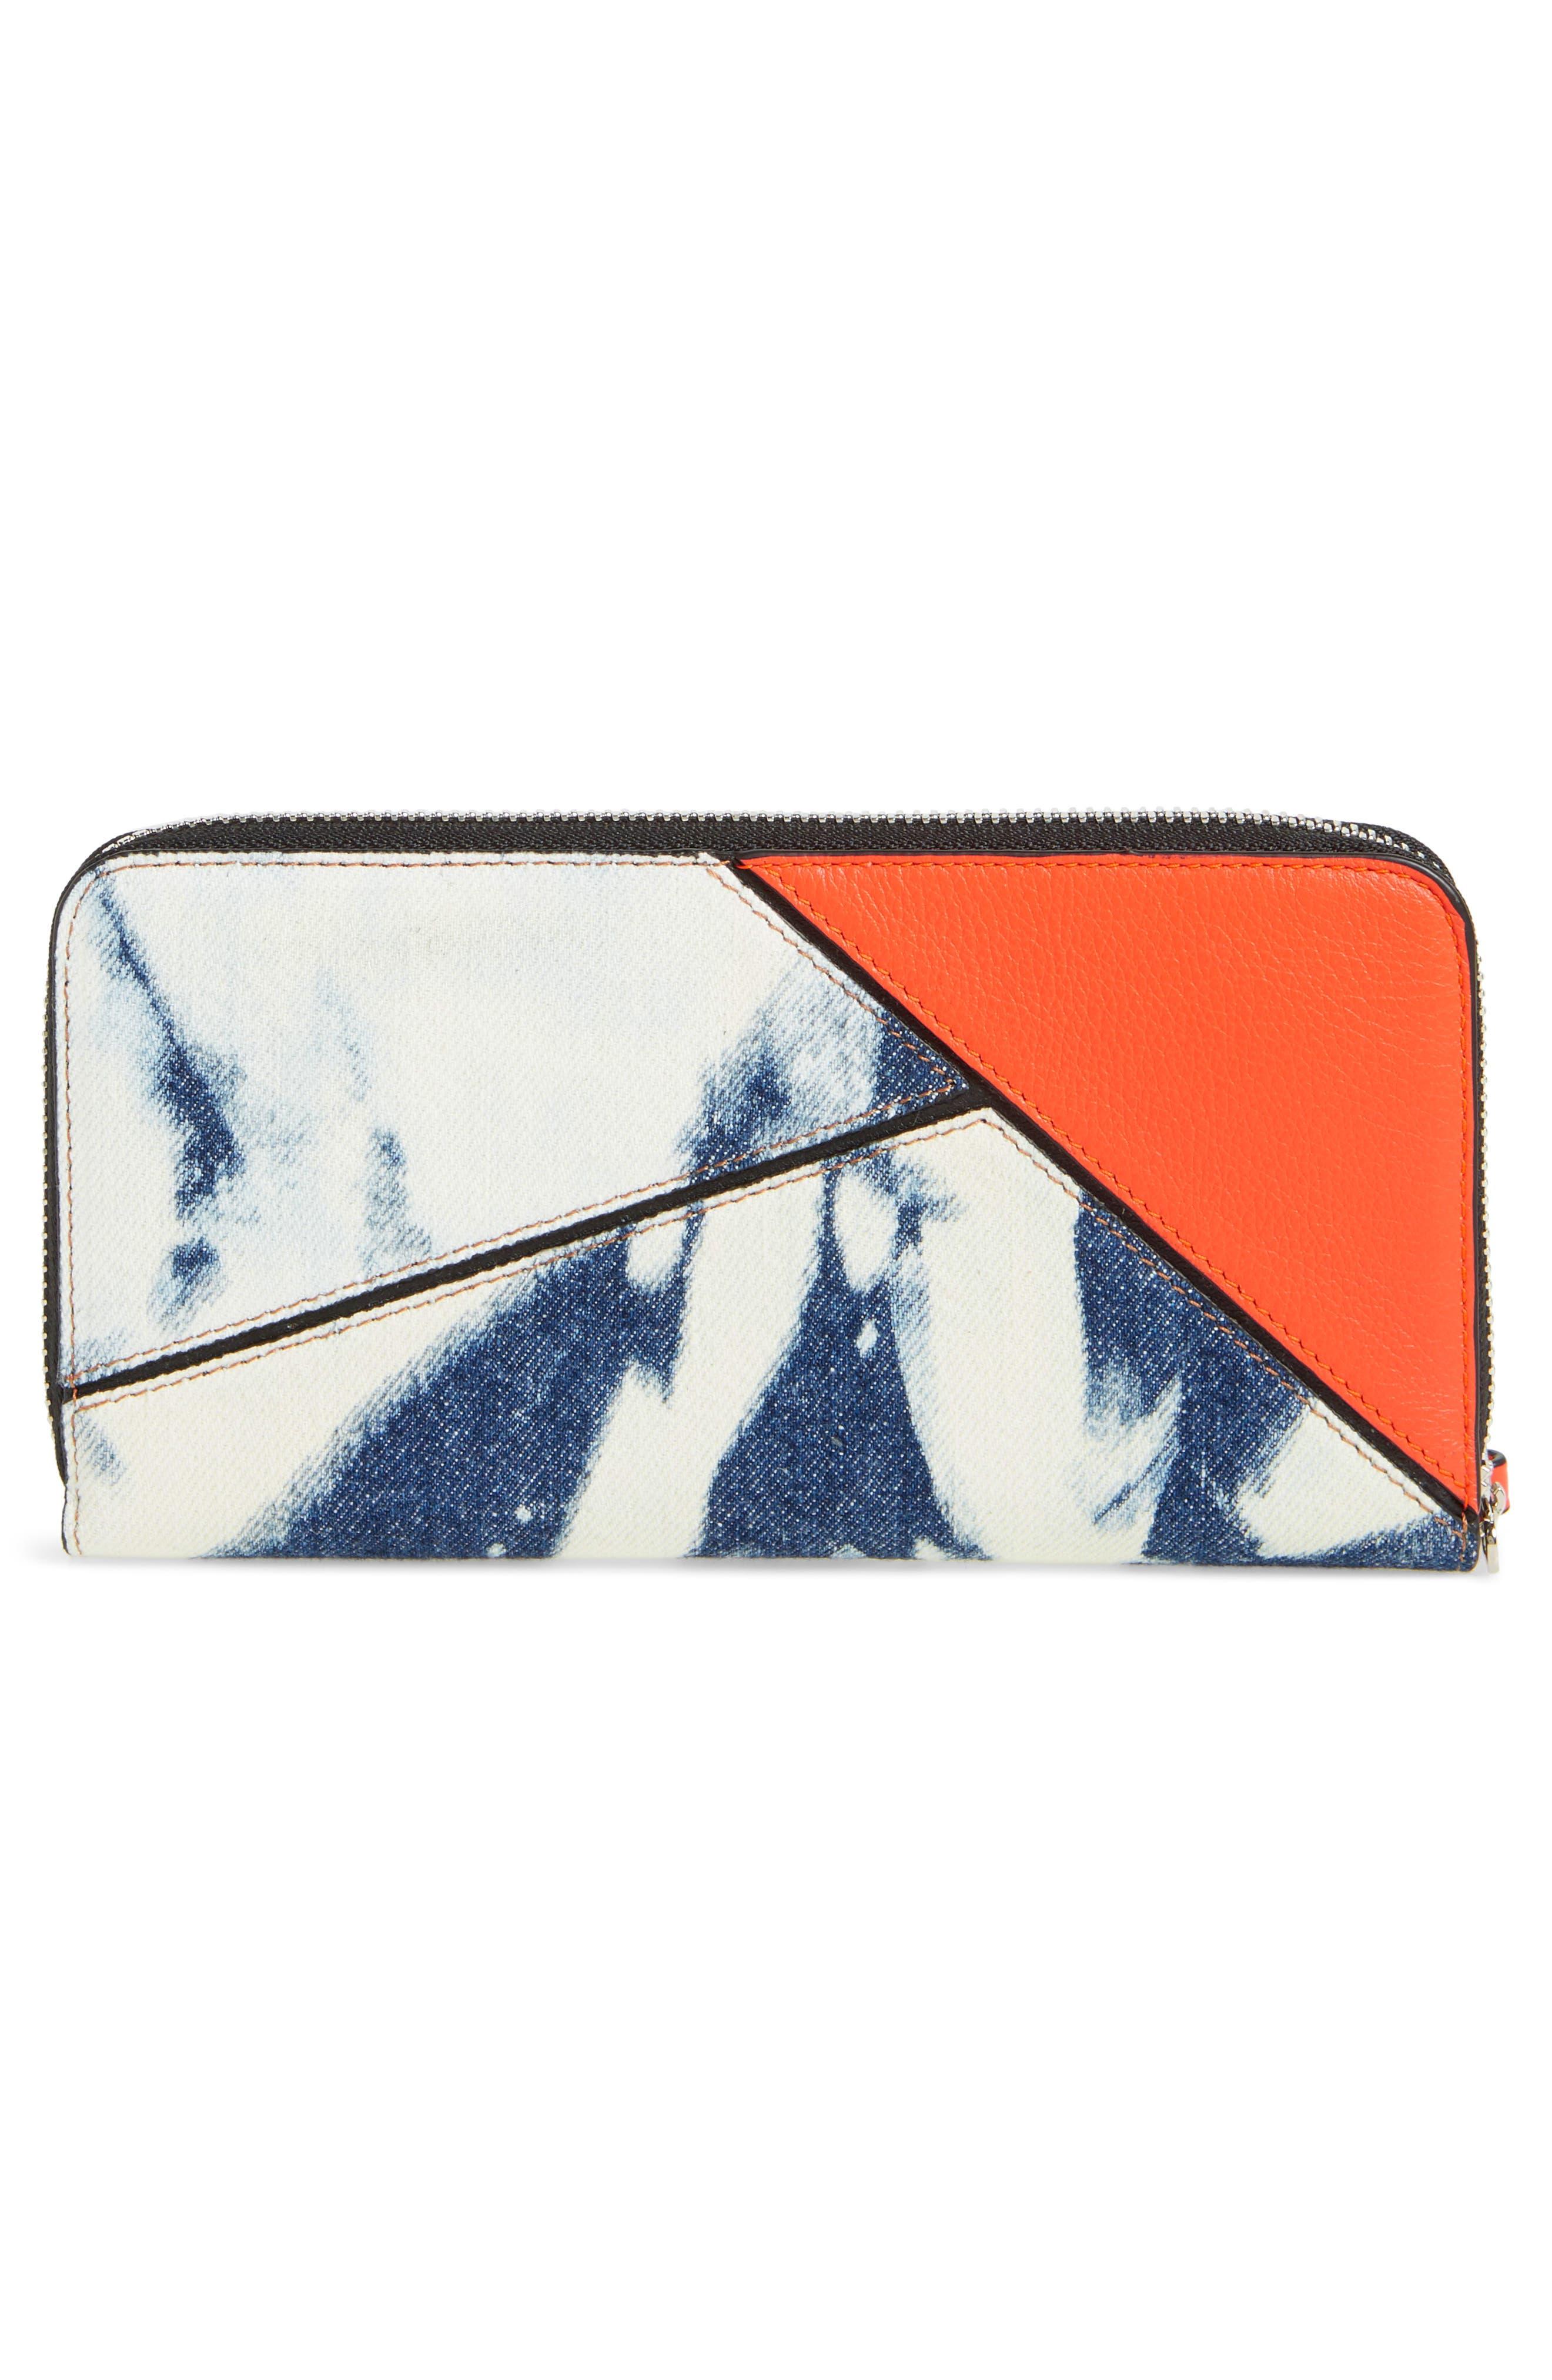 Alternate Image 3  - Loewe Denim Puzzle Zip Around Leather Wallet